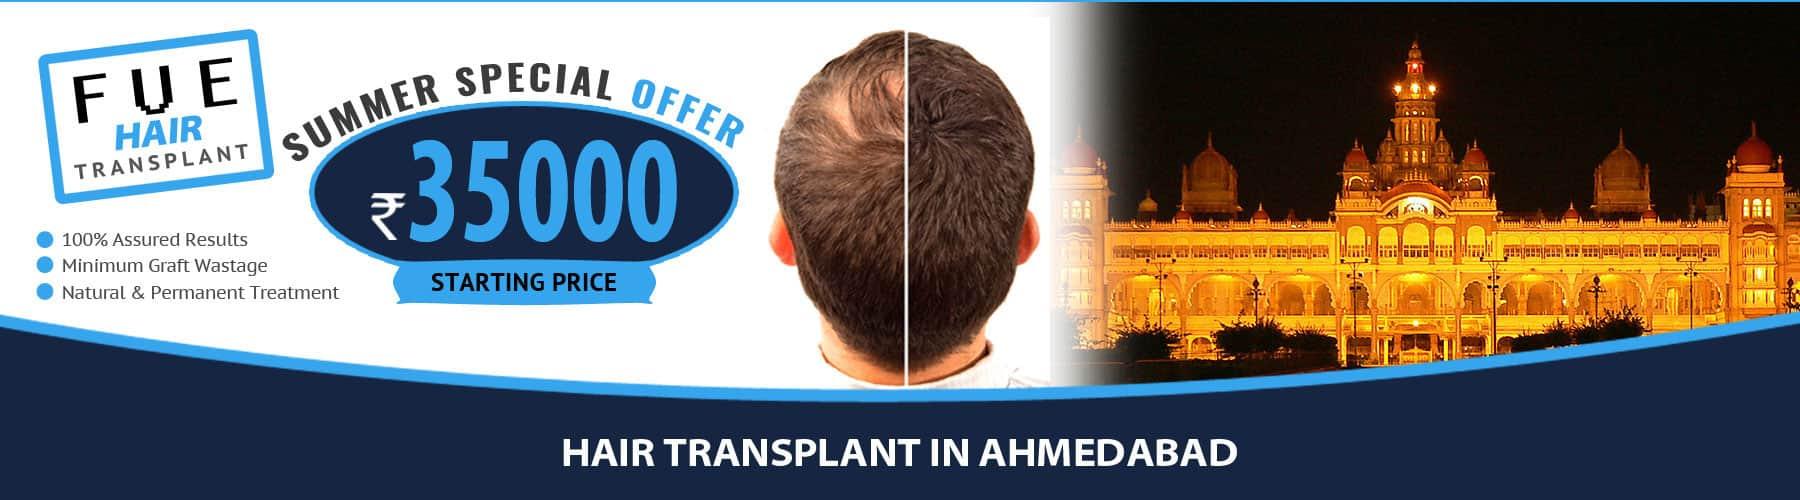 Hair Transplant Ahmedabad